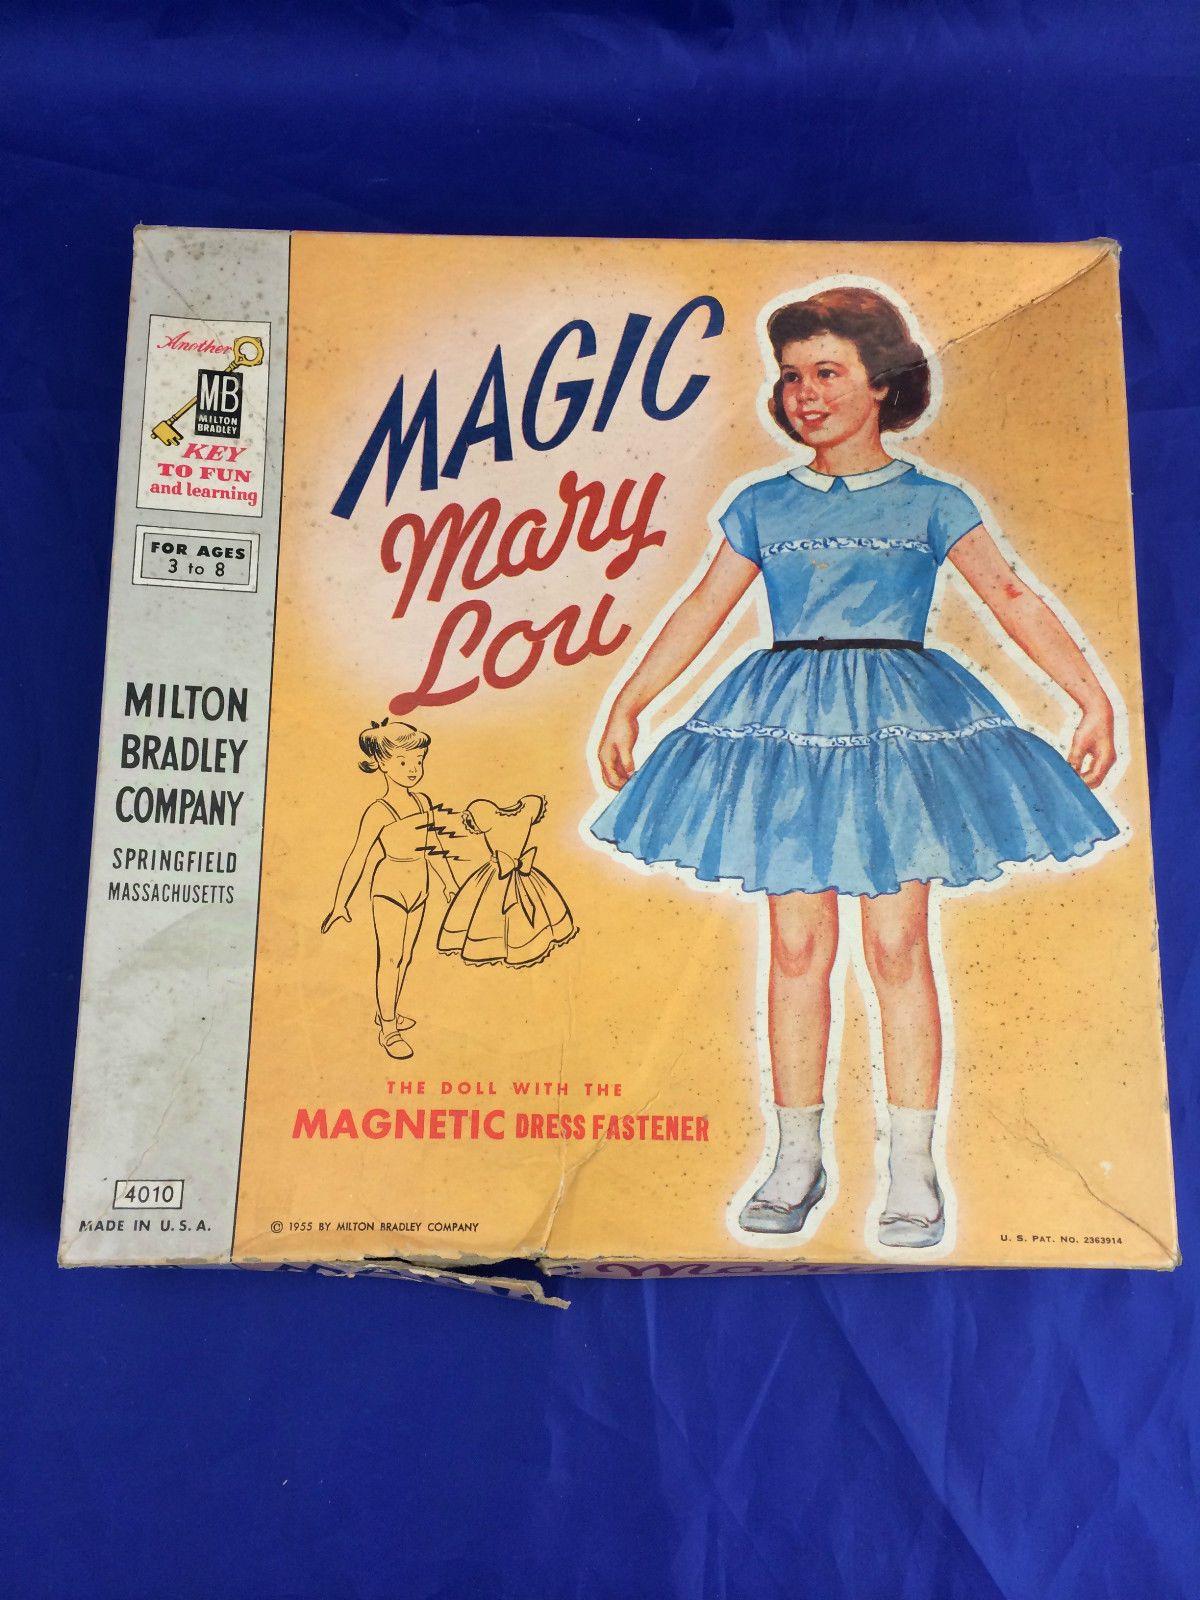 Original Vintage Paper Dolls Magnetic Magic Mary Lou 1955 by Milton Bradley | eBay